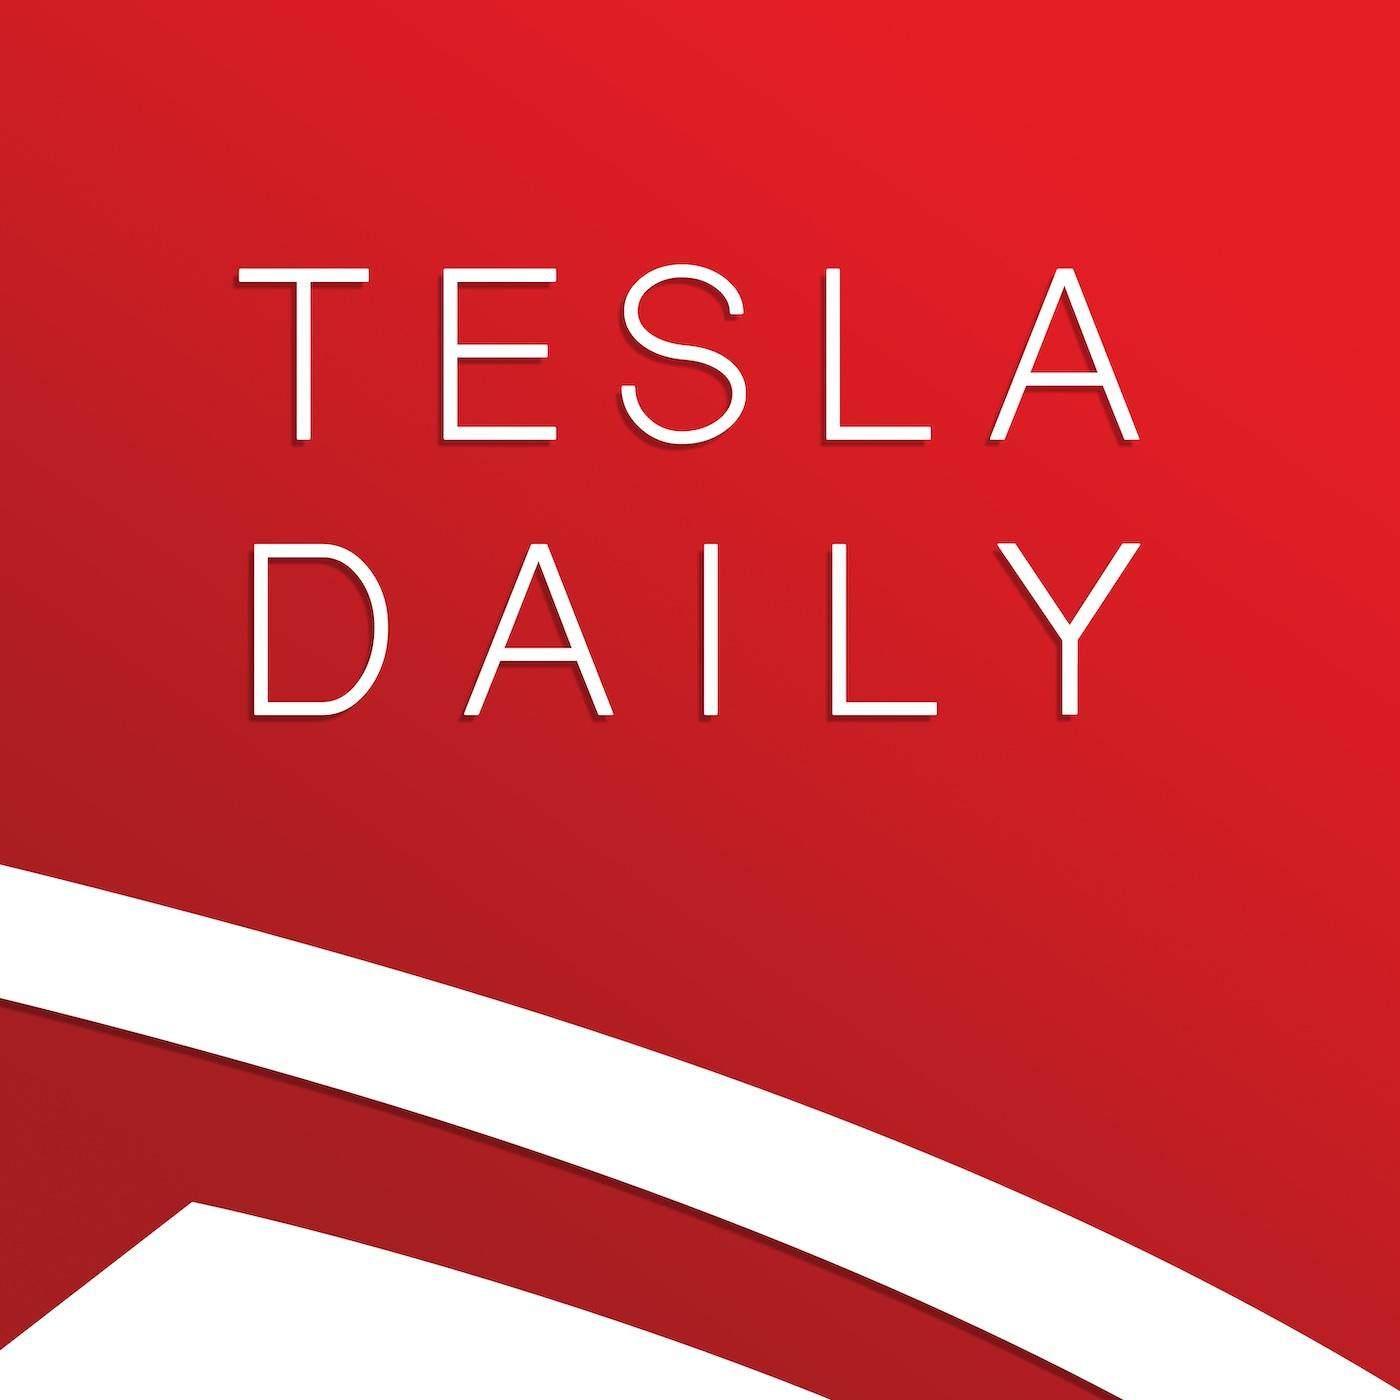 Most Valuable Automaker as TSLA Hits $1,000 (06.10.20)